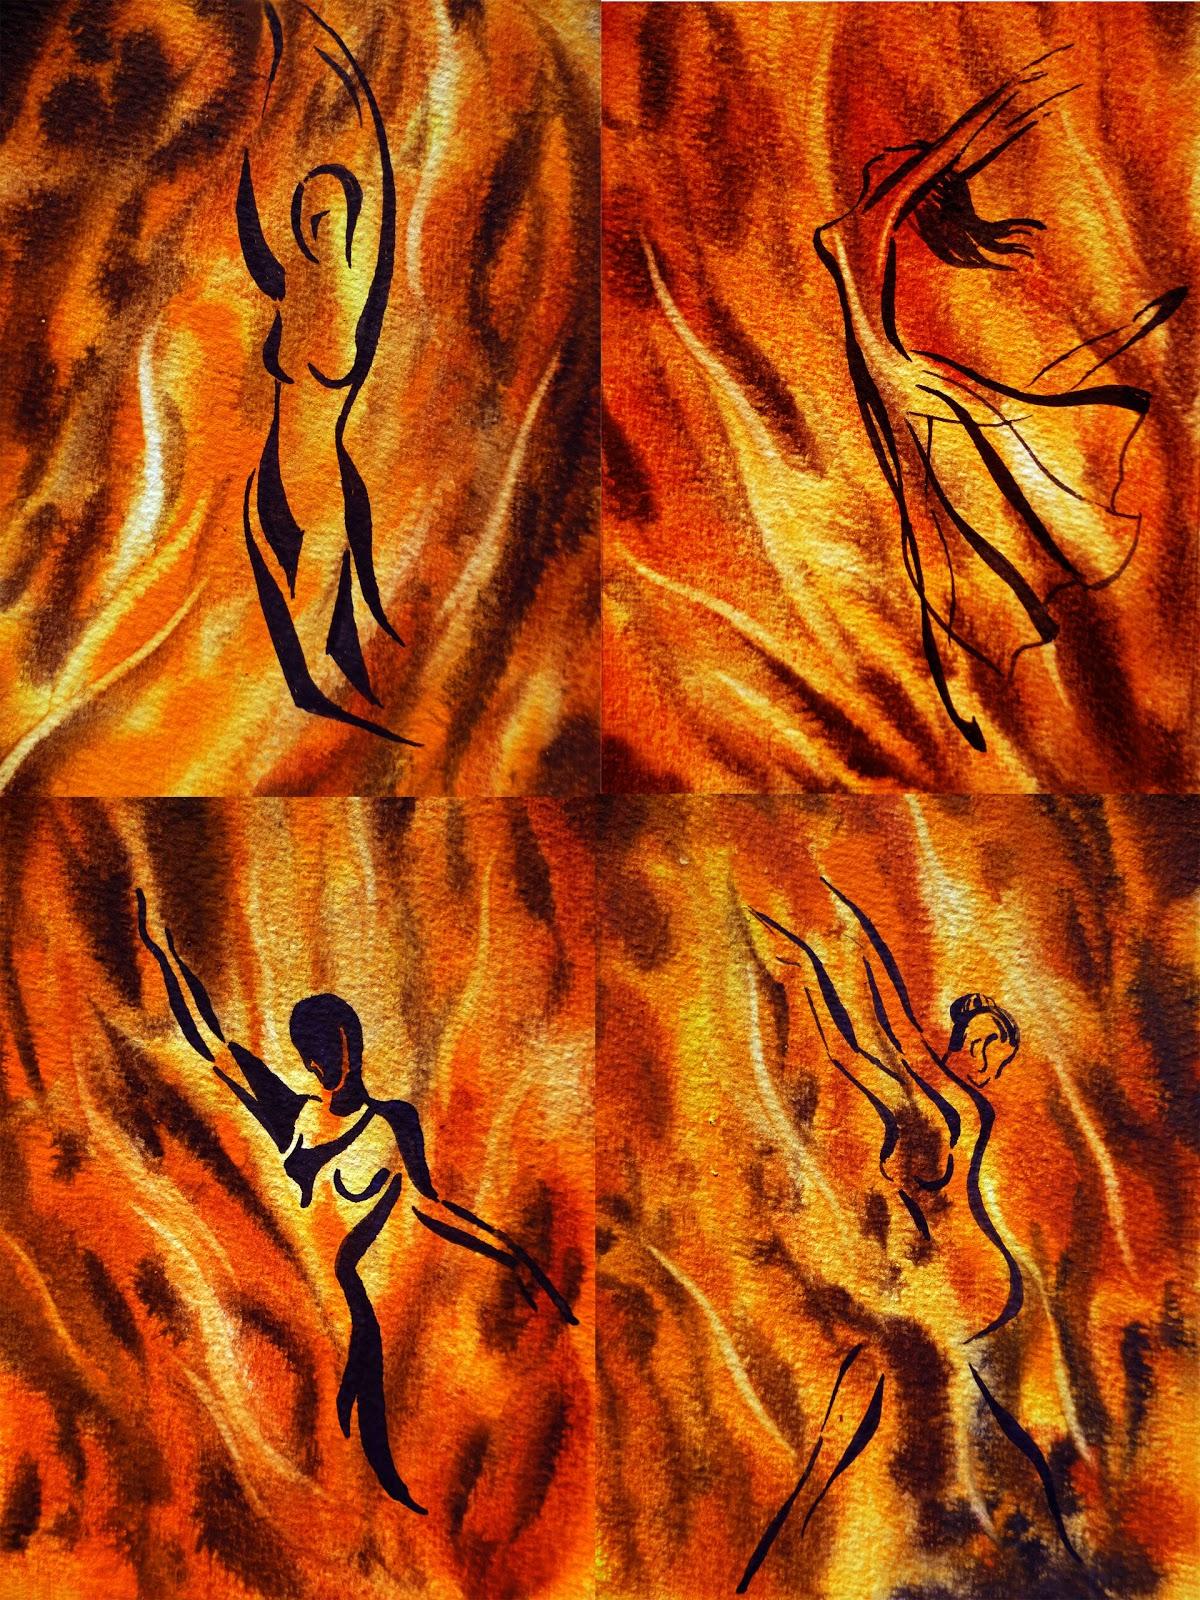 Dancing Fire | Artist Illustrator Irina Sztukowski Her Art Journey